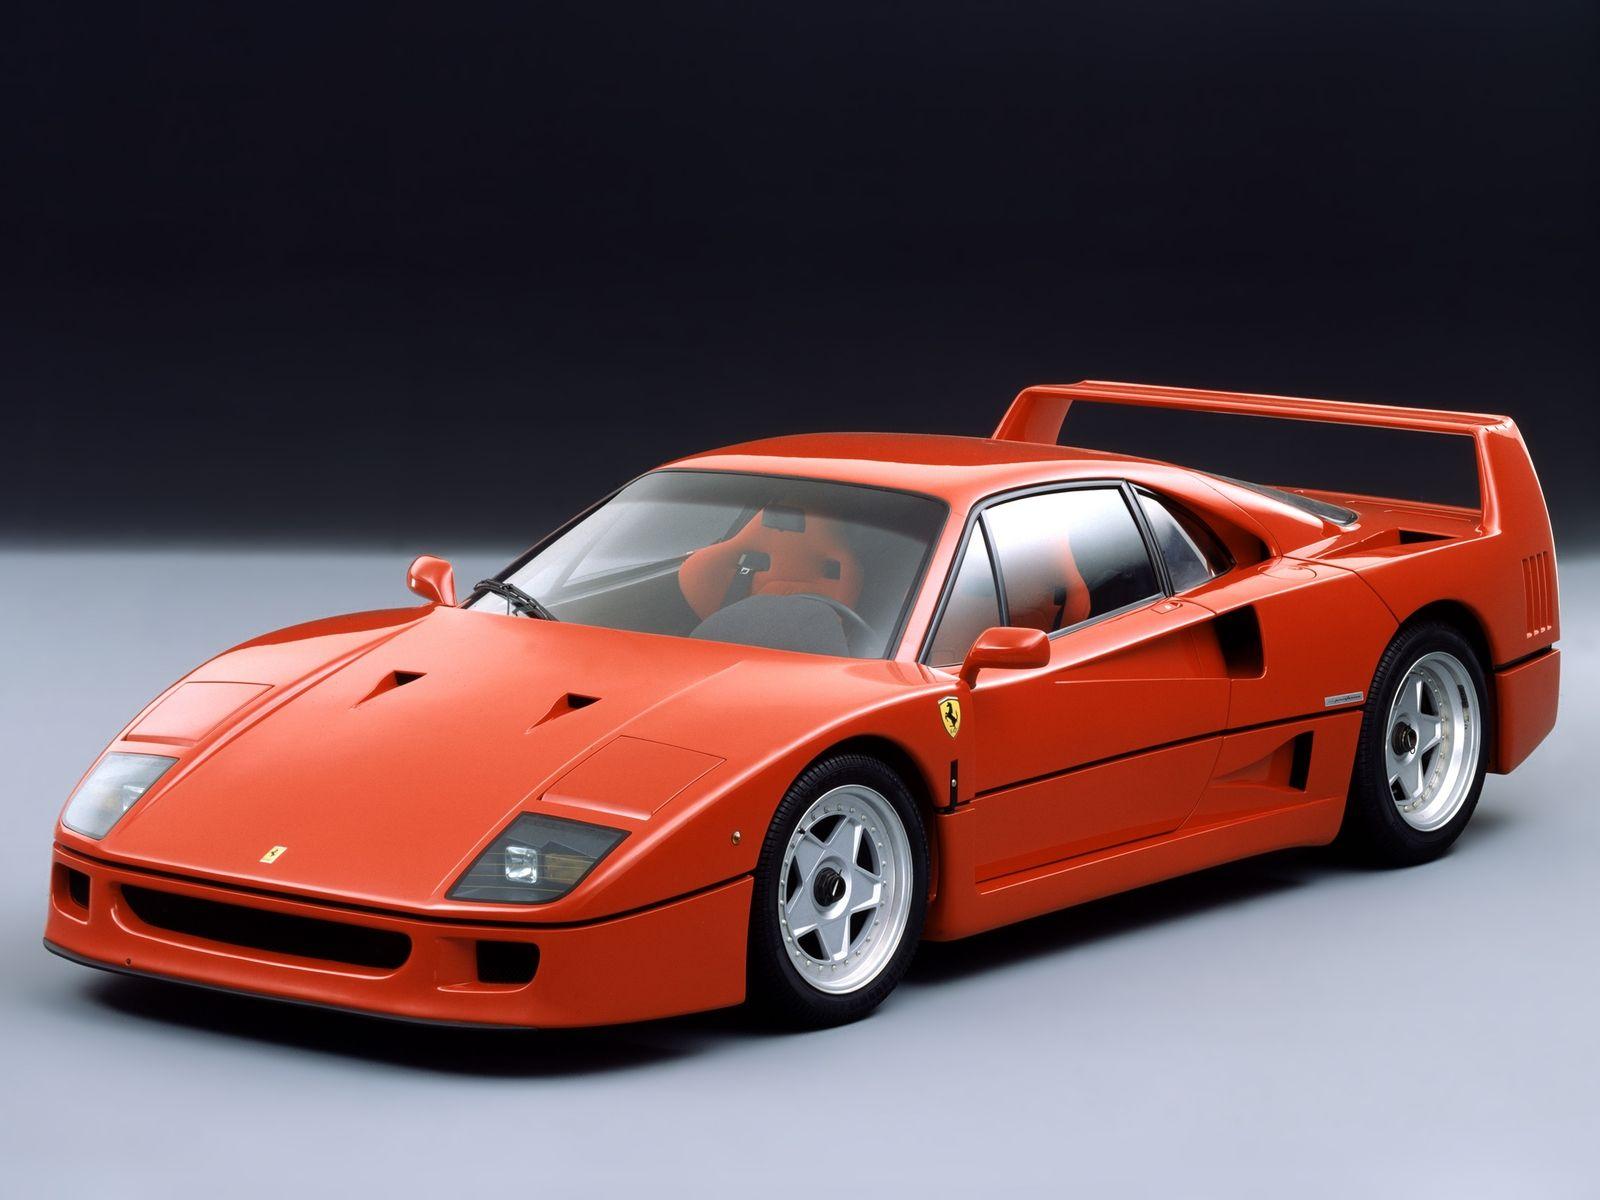 Ferrari F40 Car Gallery 27976   Copadeora